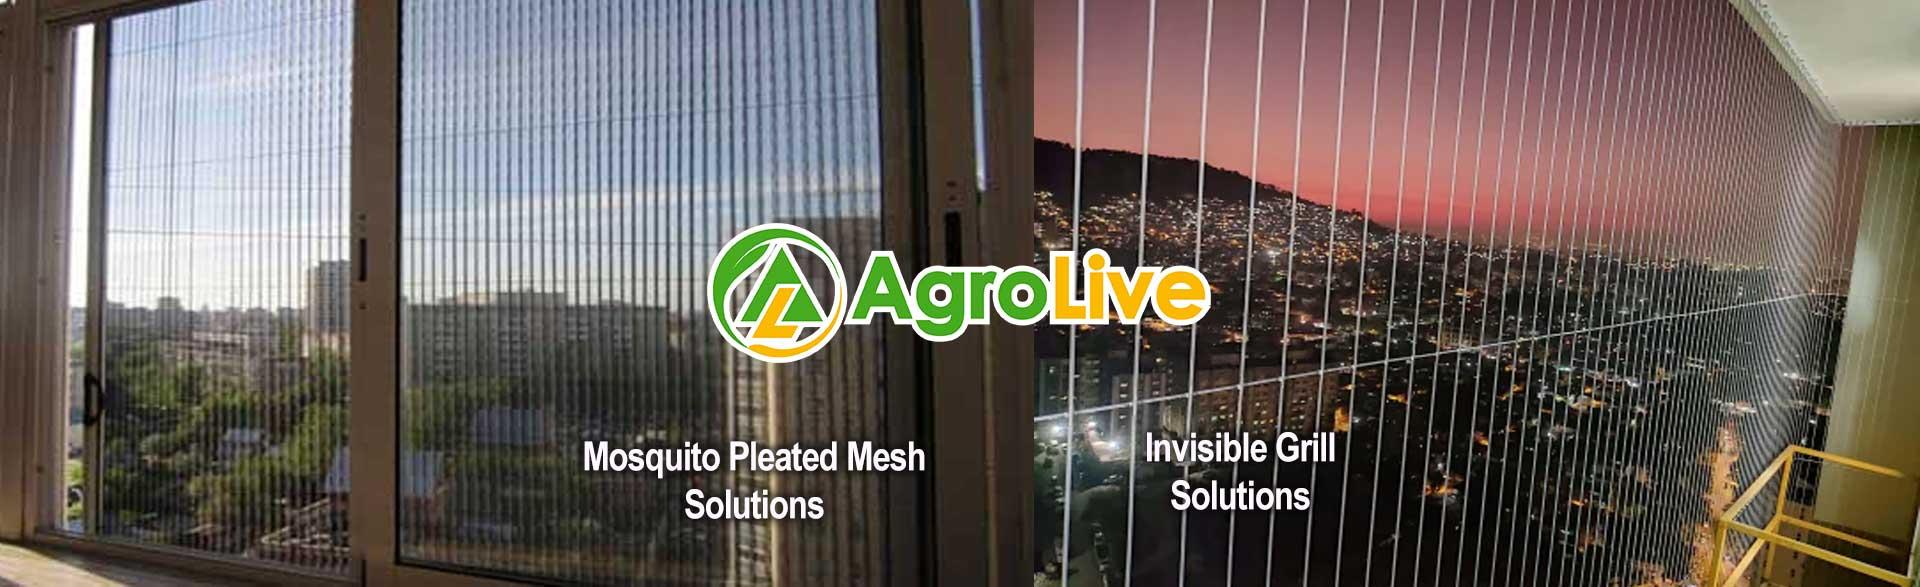 Agro Pesto large scale farming